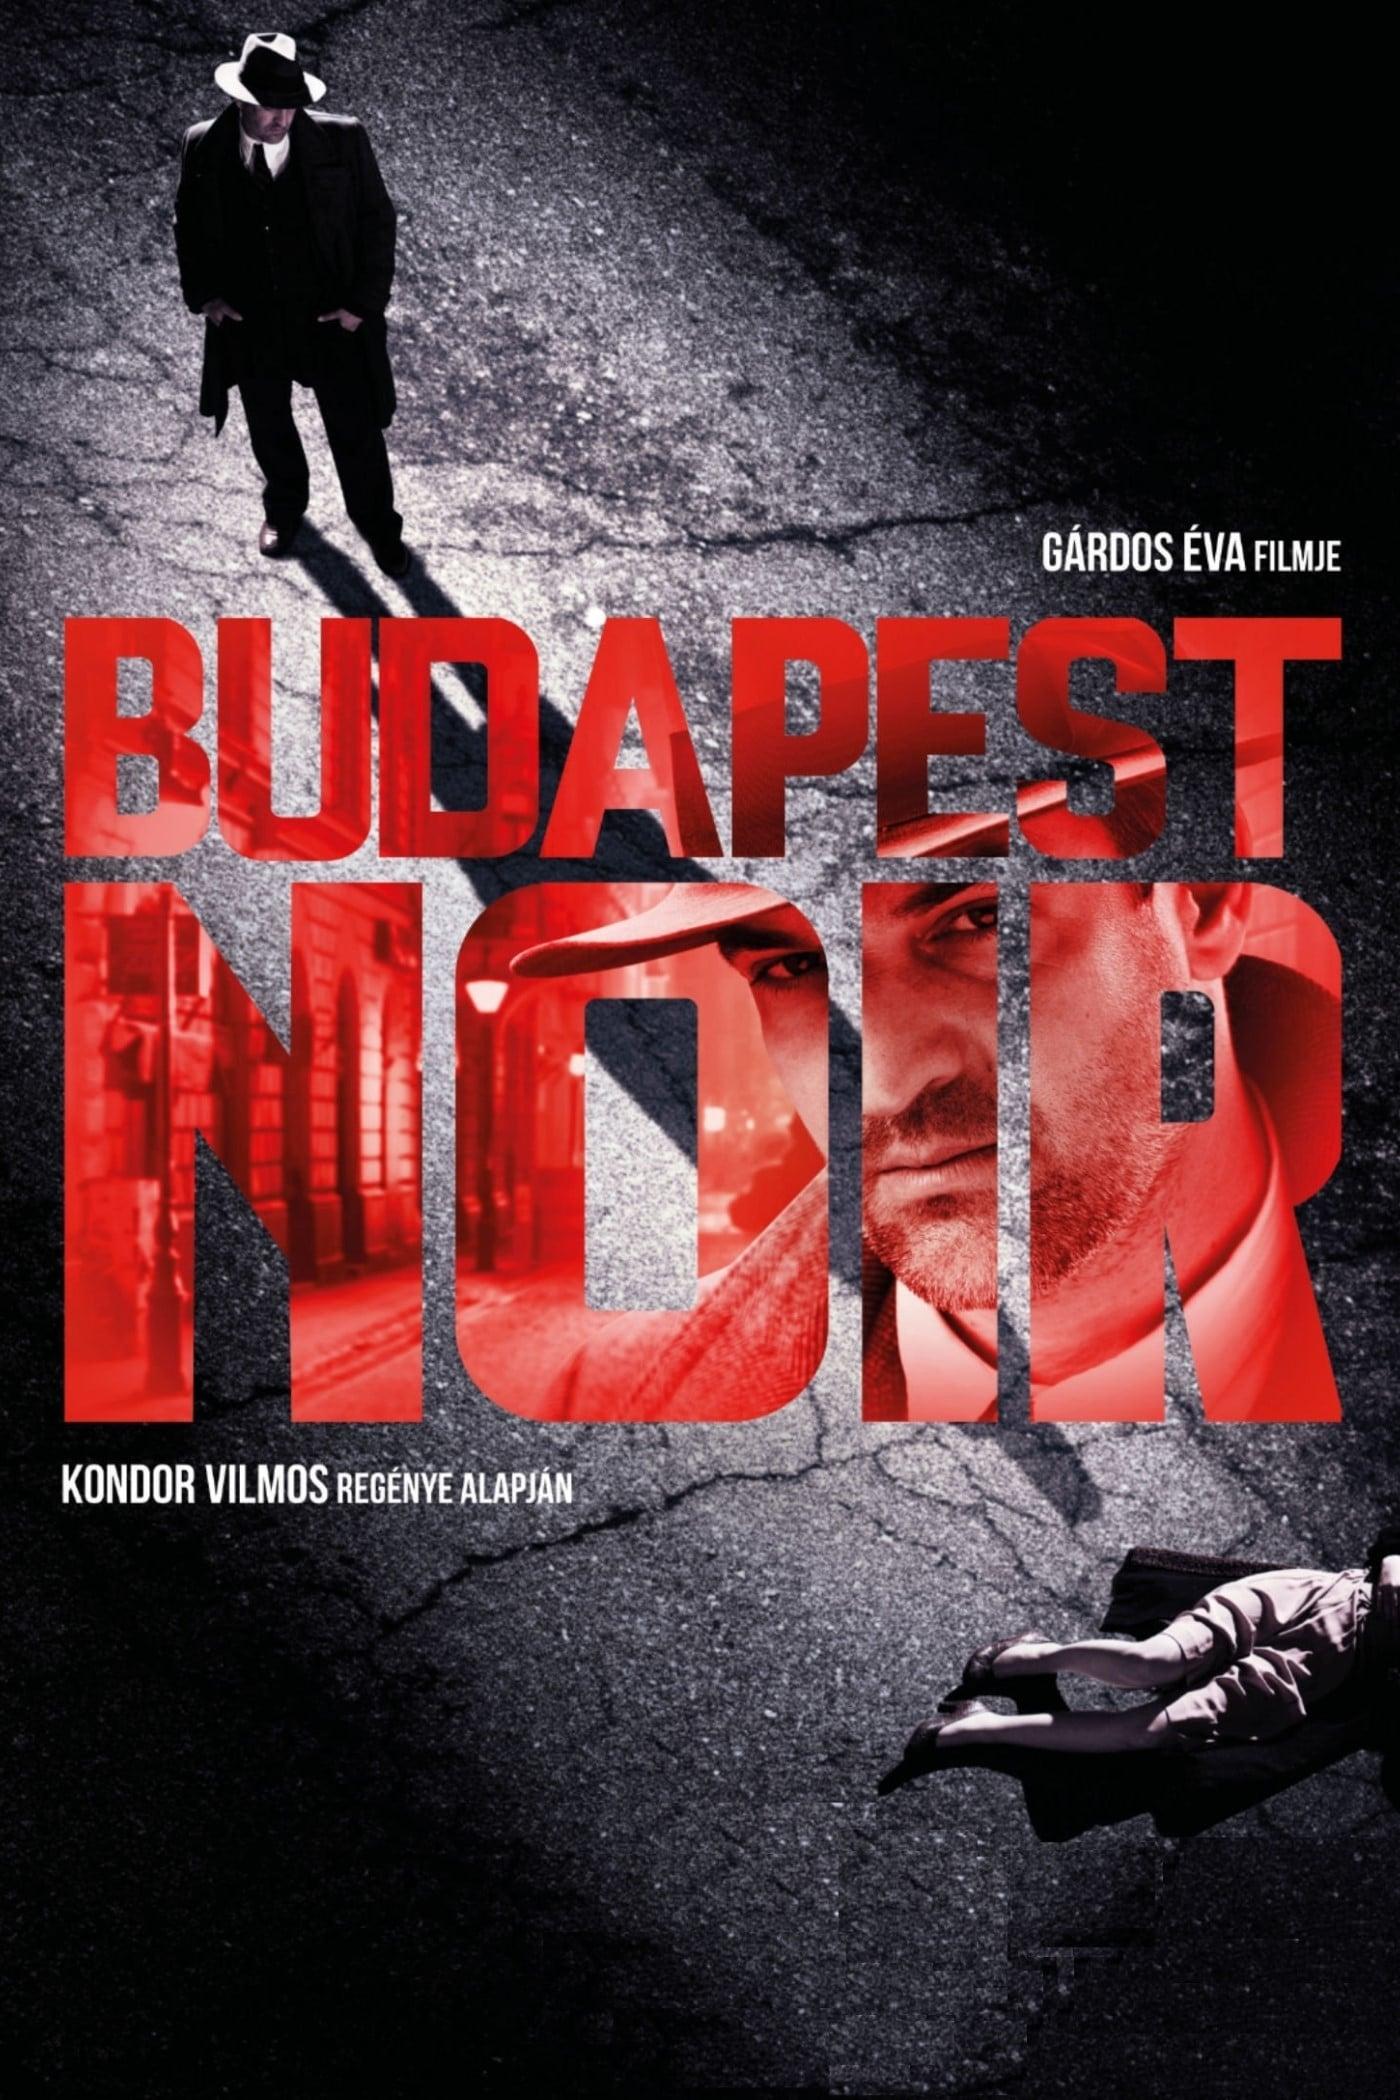 Budapest.Noir.2017.REPACK.480p.BluRay.DD5.1.x264-pcroland